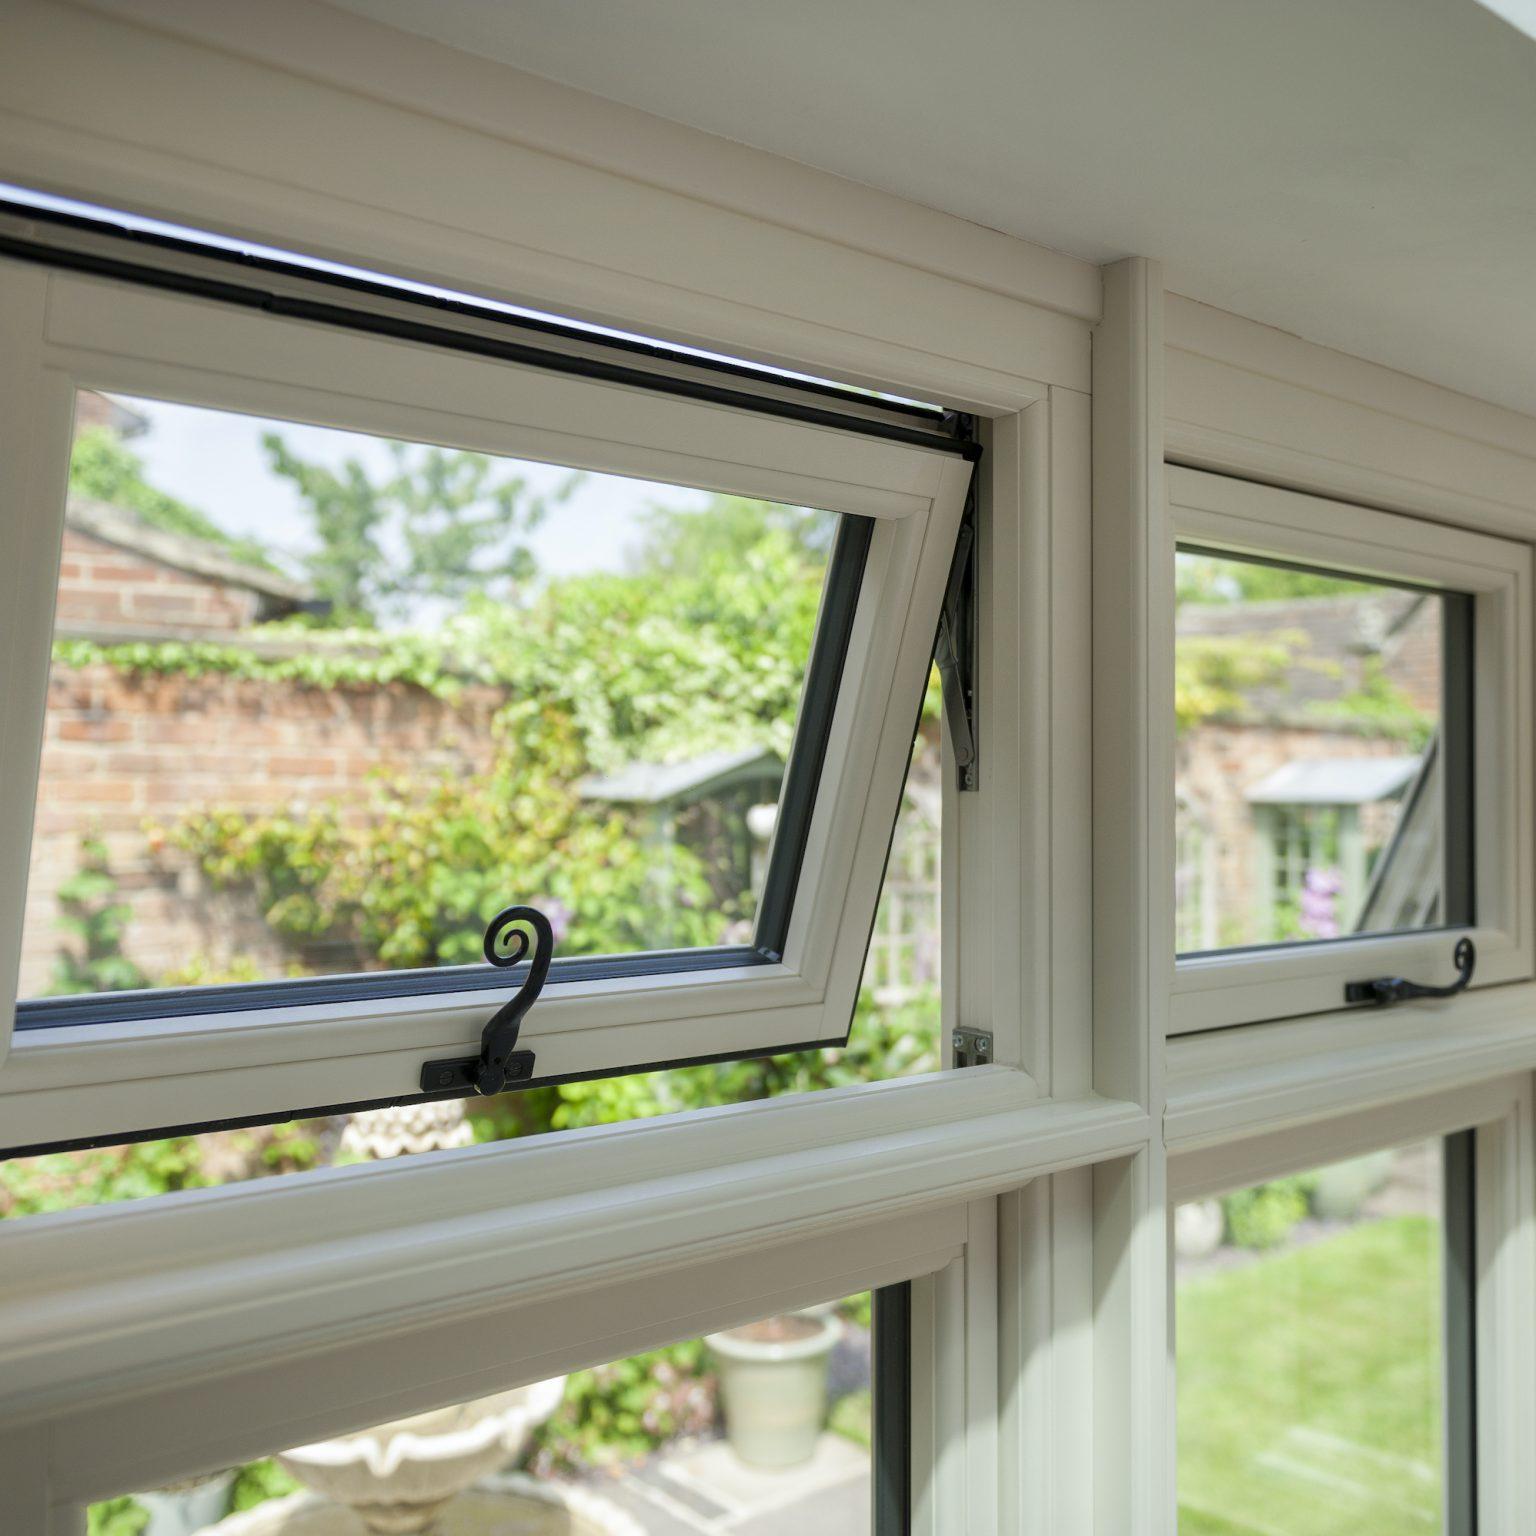 residence windows and doors